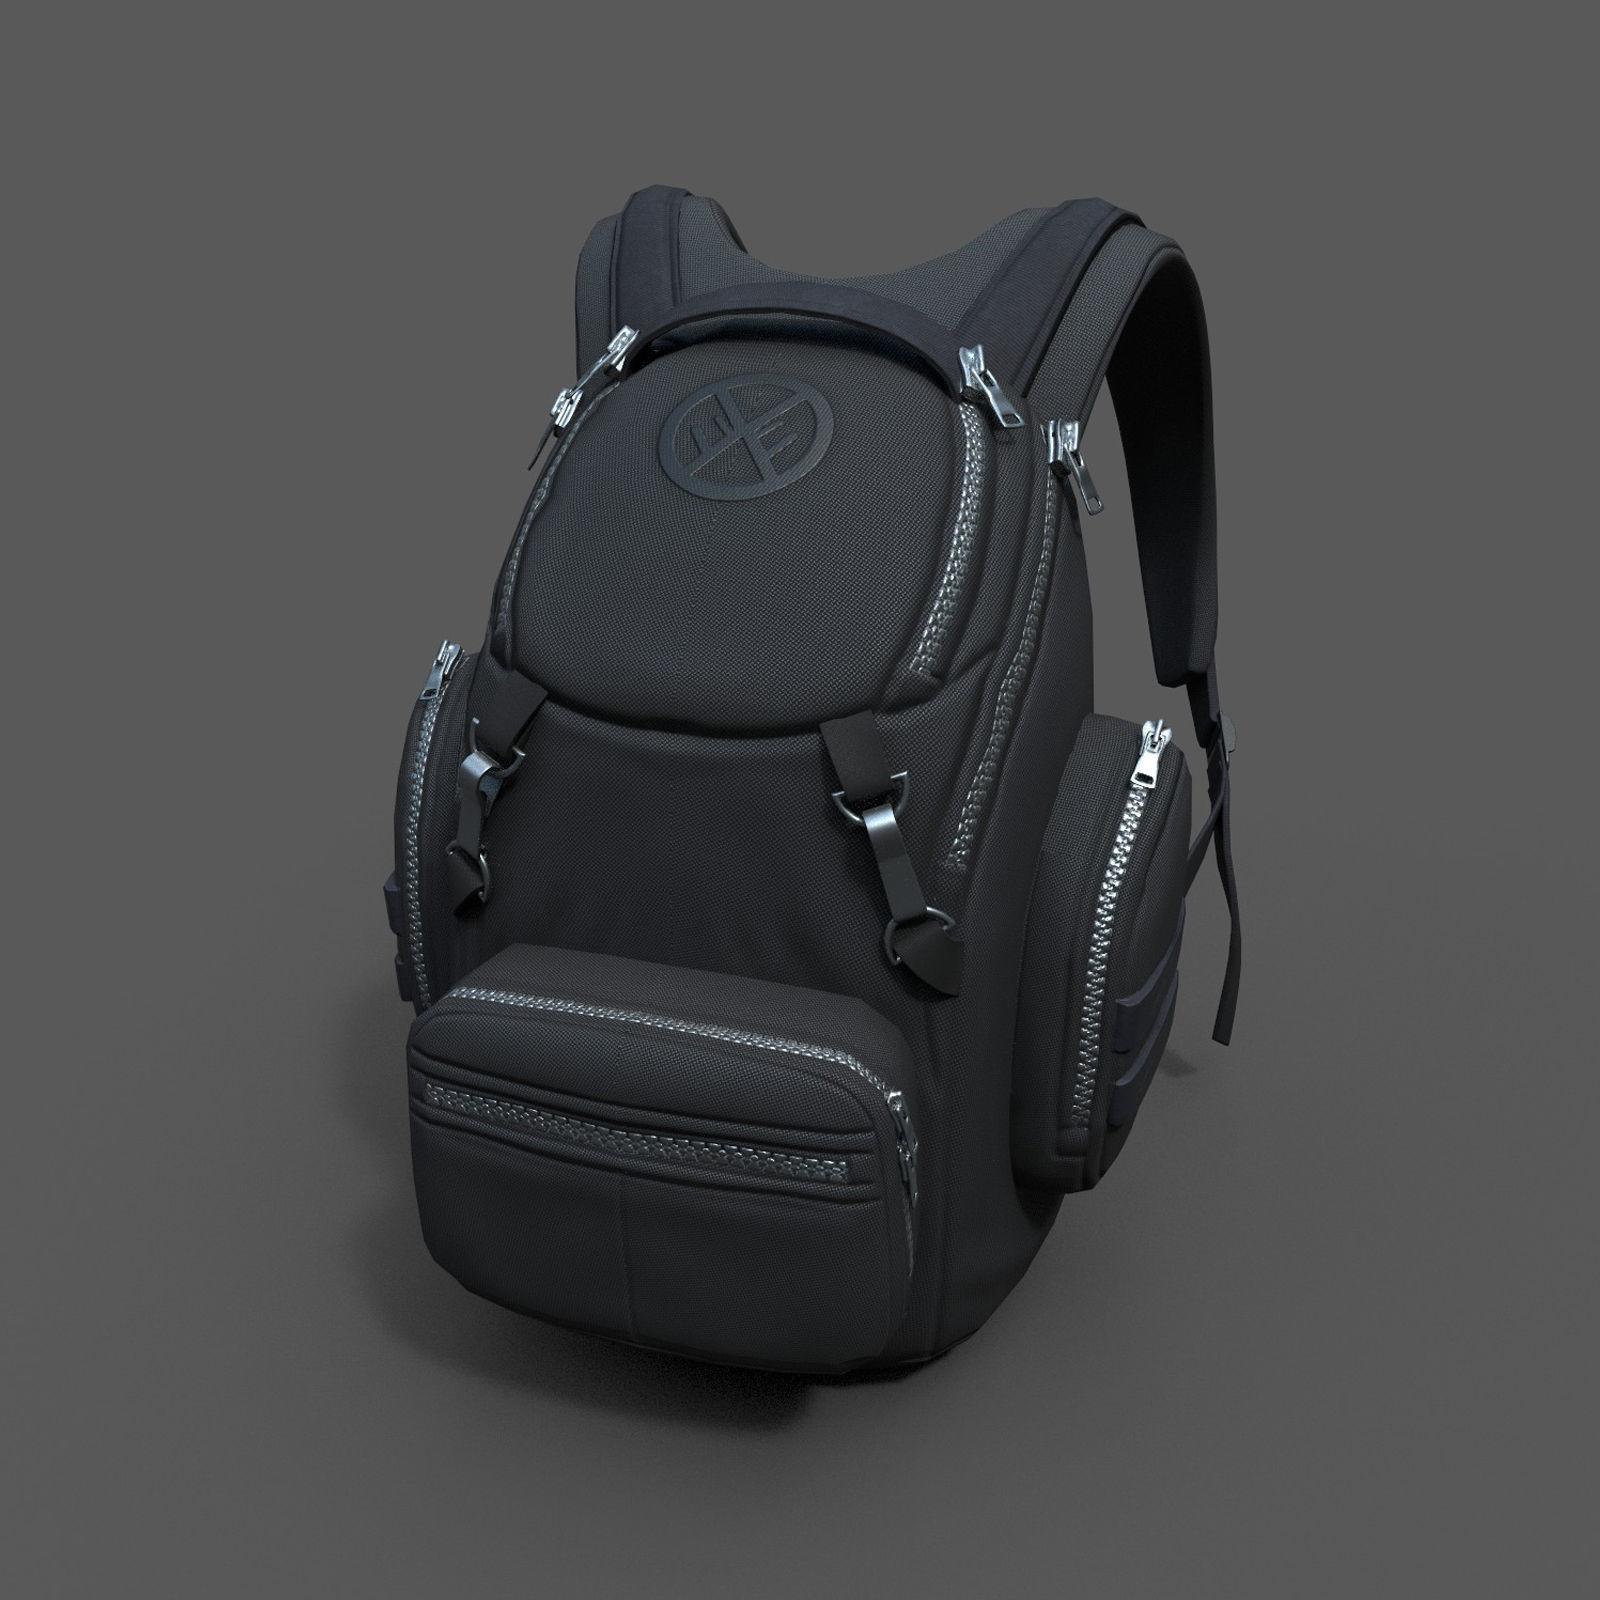 Human Backpack scifi ver 3